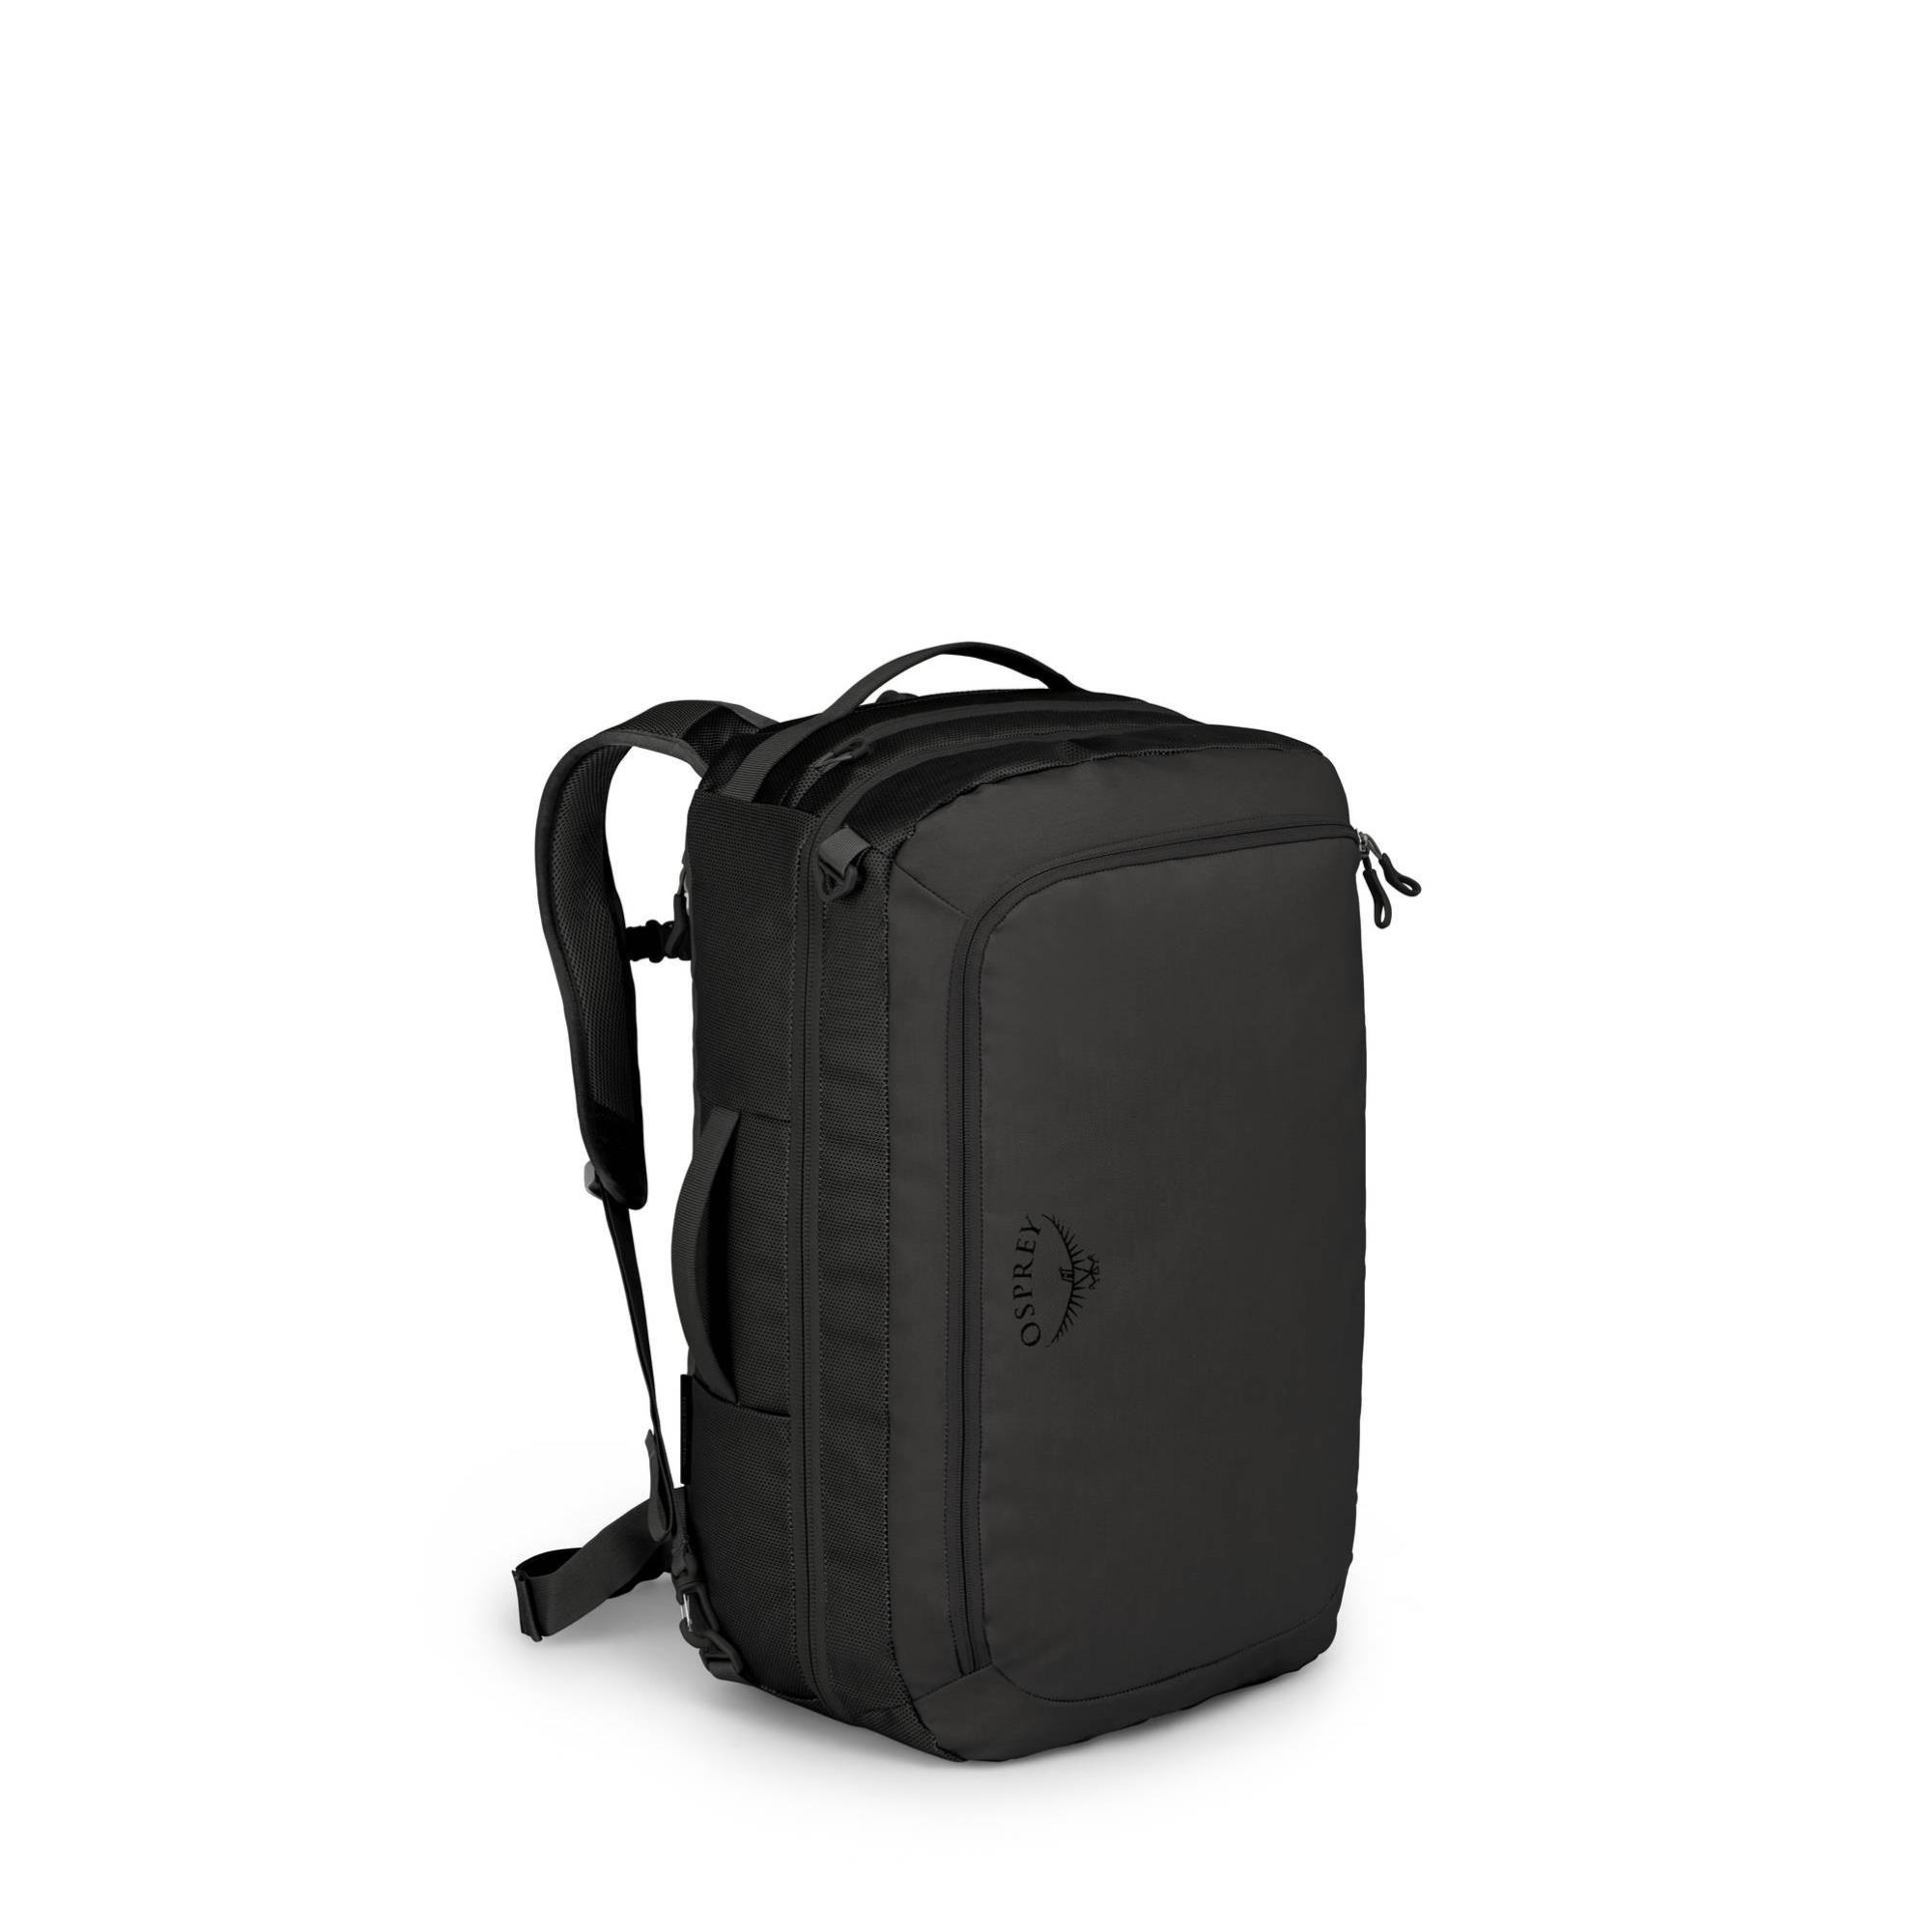 Transporter Carry-On 44 Reiserucksack schwarz,black